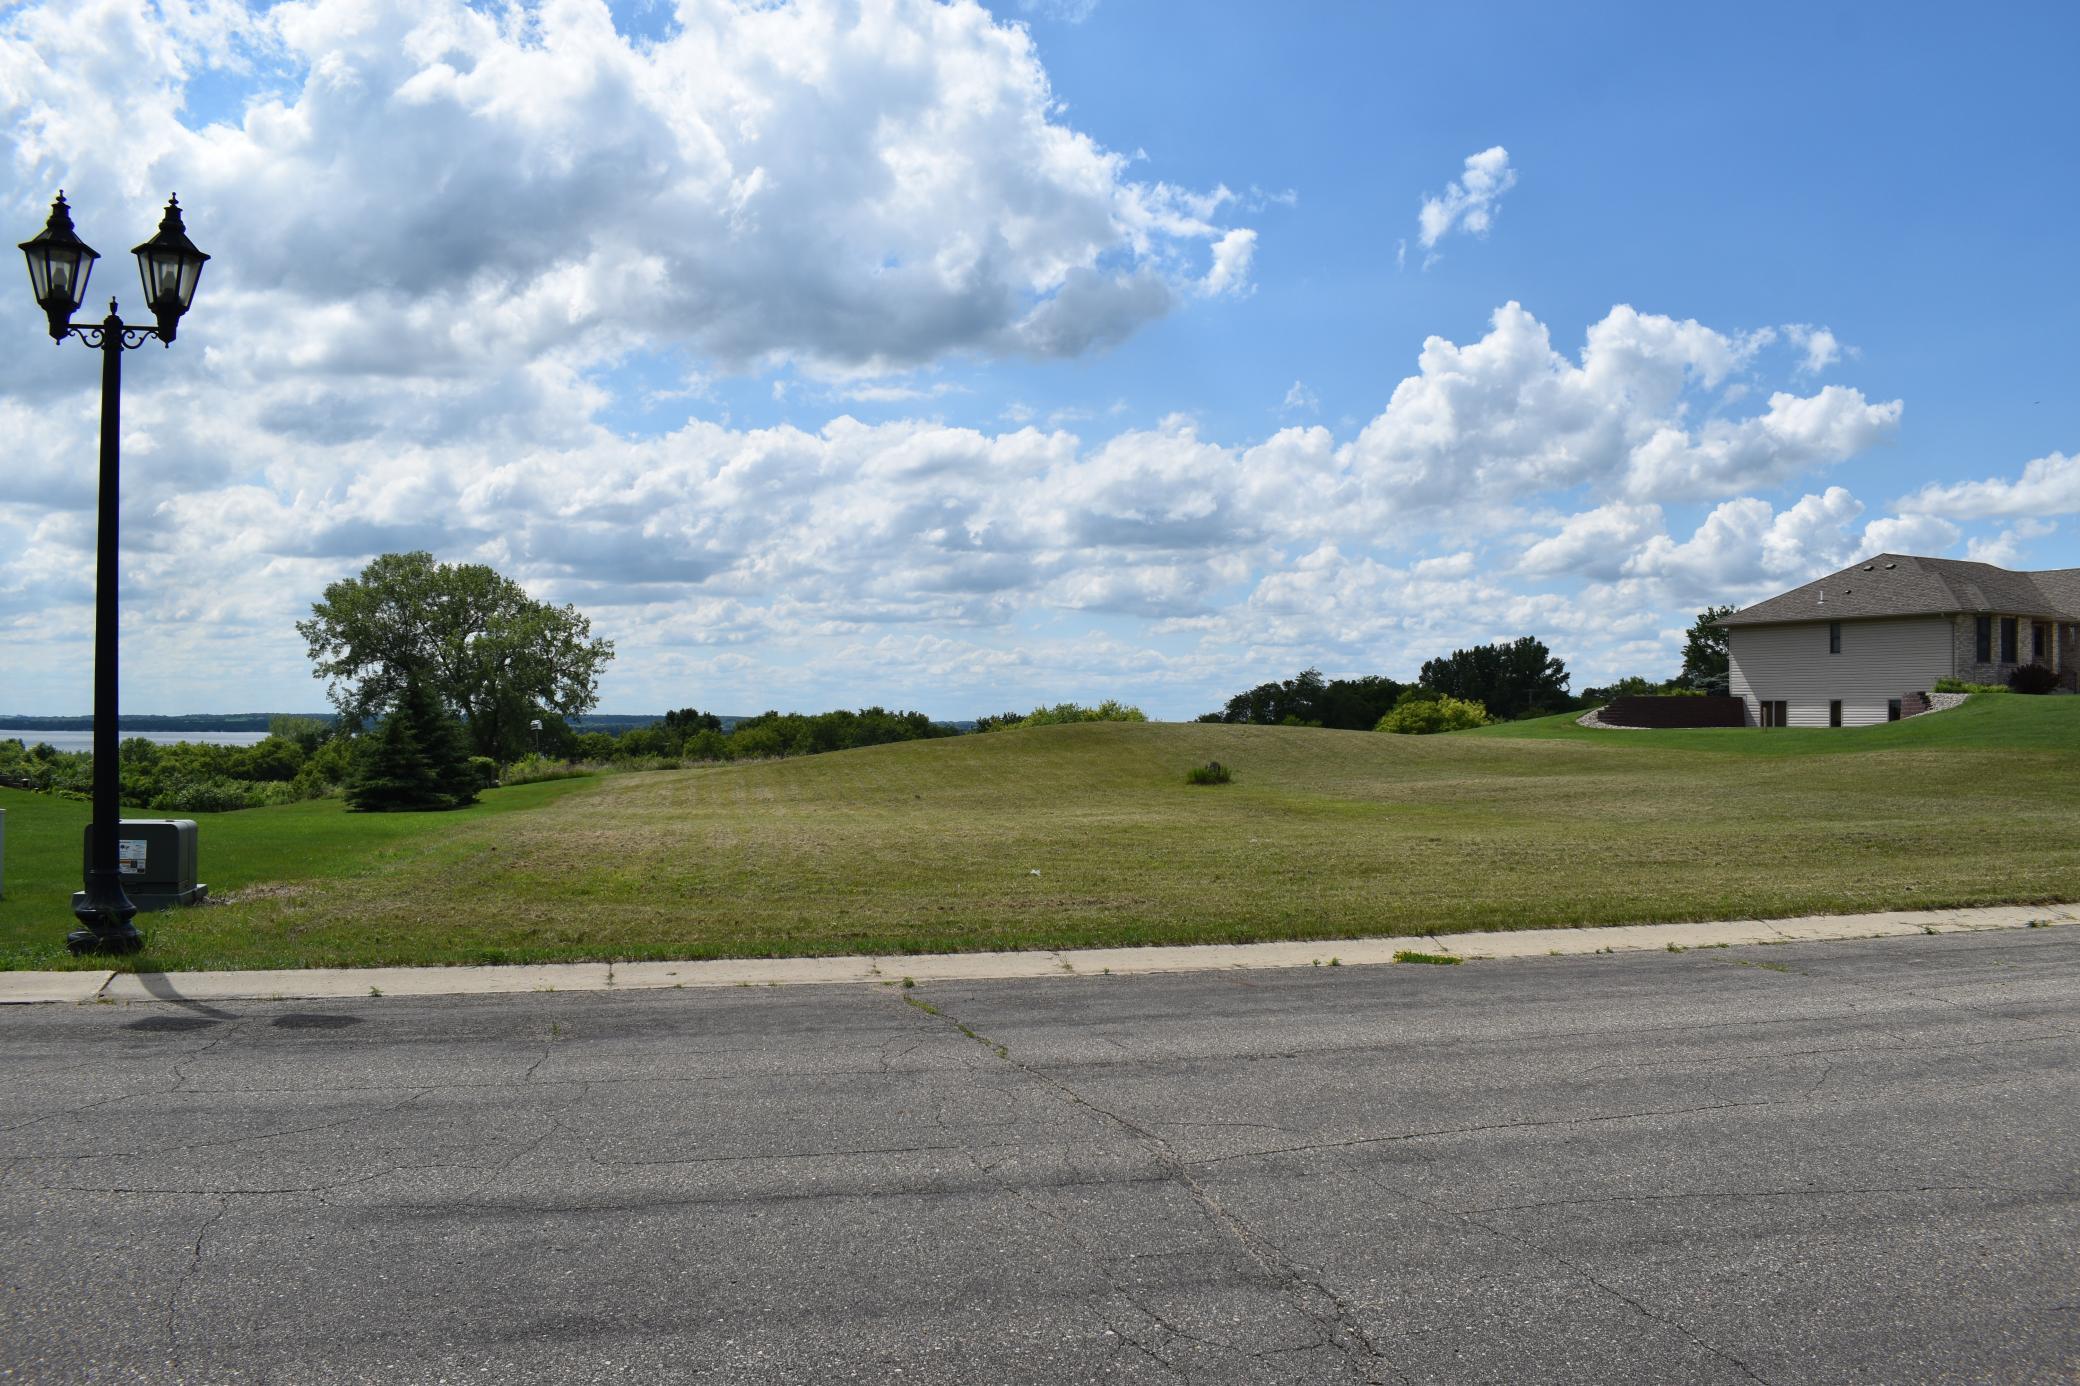 541 Depree Property Photo - Glenwood, MN real estate listing